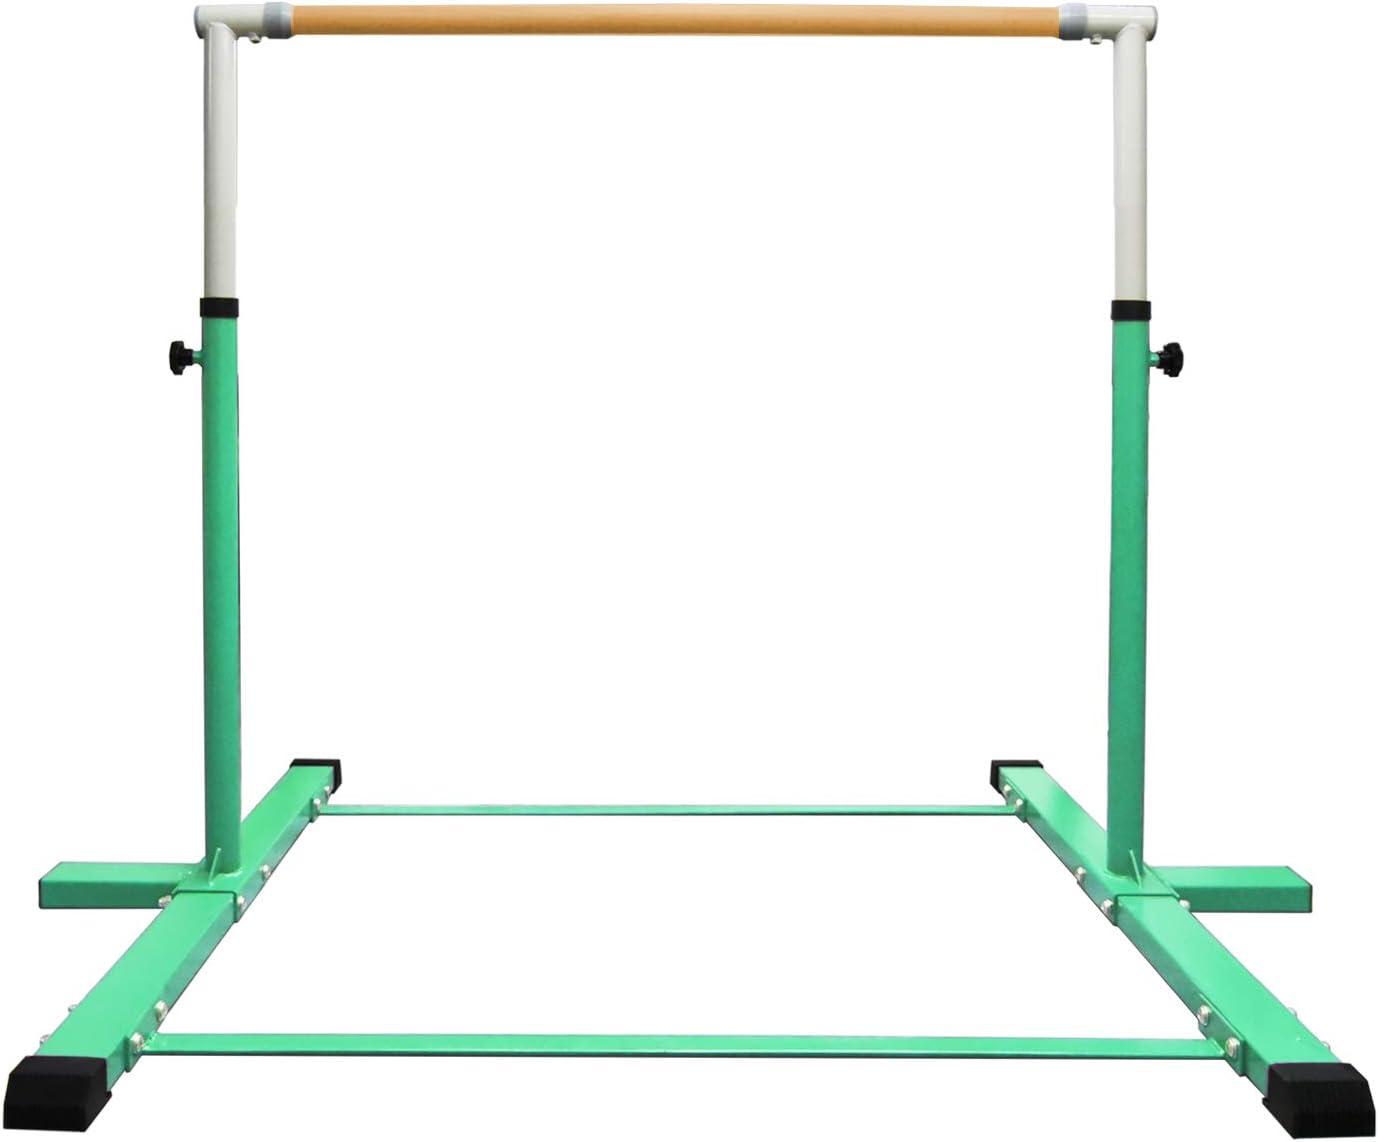 EZ GLAM Adjustable (3'-5') Horizontal Training Bar 1-4 Levels,260lbs Weight Capacity